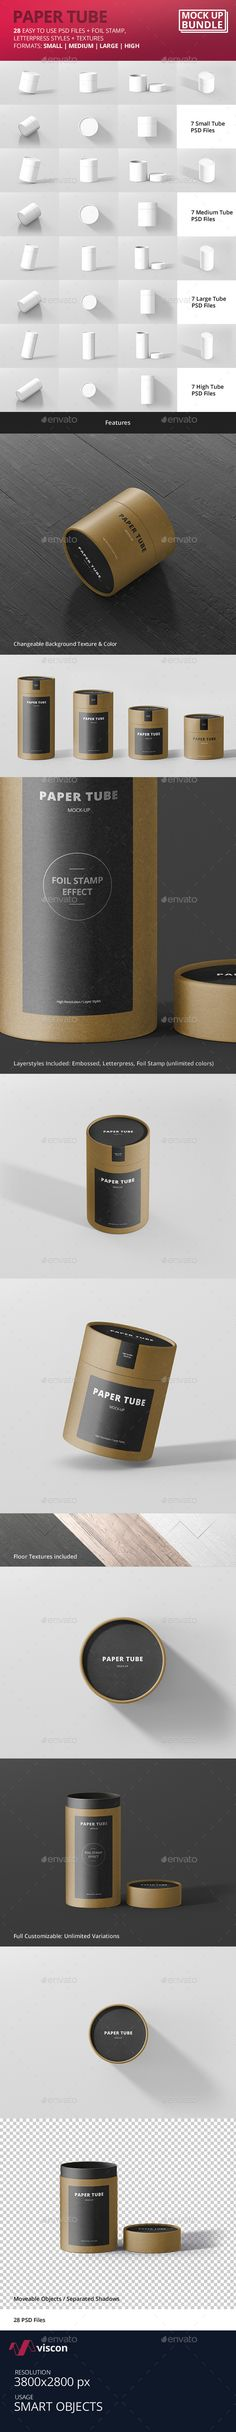 Paper Tube Packaging Mock-Up Bundle. Download here: https://graphicriver.net/item/paper-tube-packaging-mockup-bundle/17051616?ref=ksioks